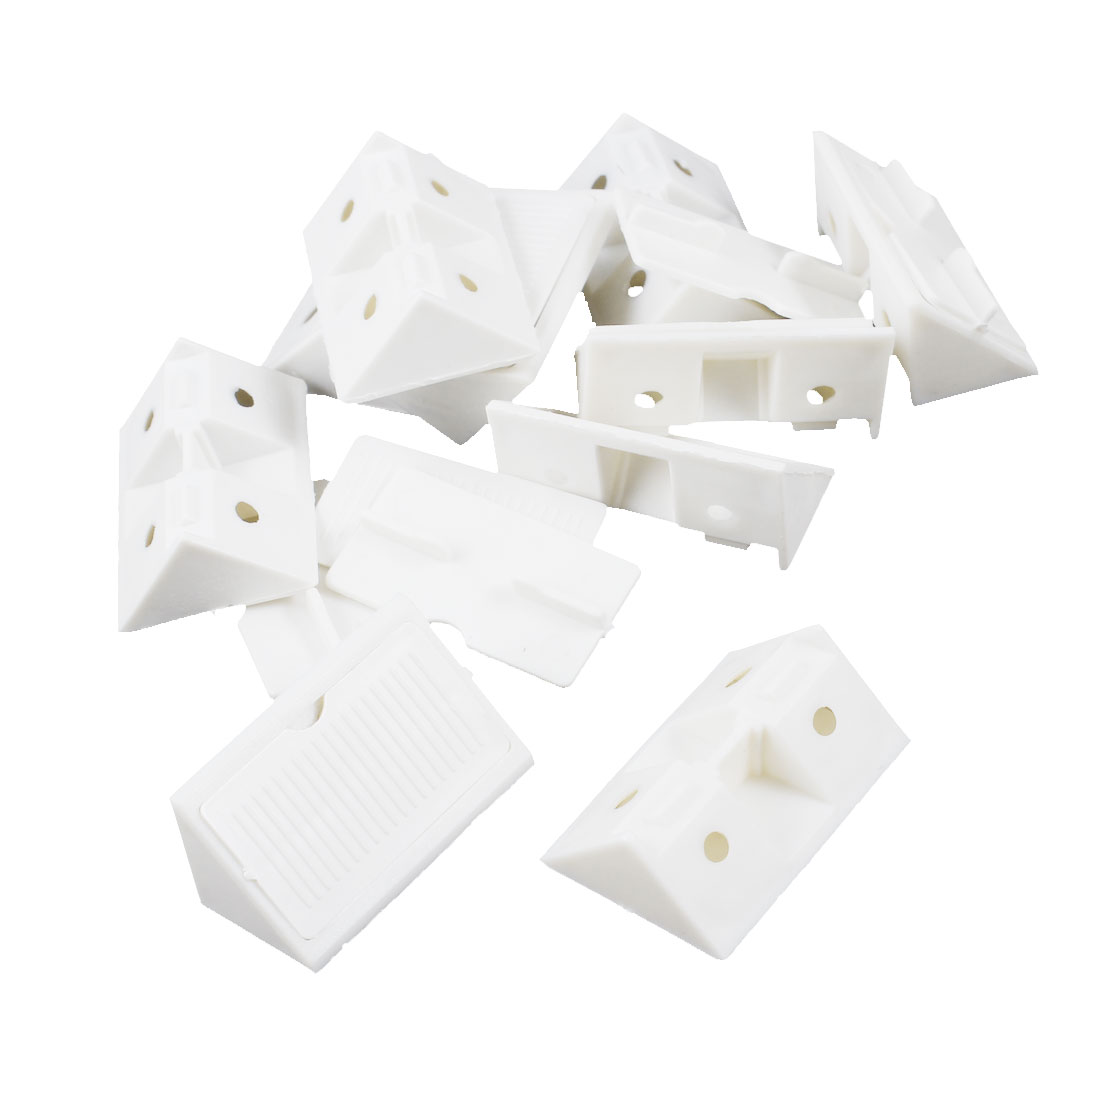 Furniture Cabinet Fastener Corner Braces Angle Brackets White 10pcs